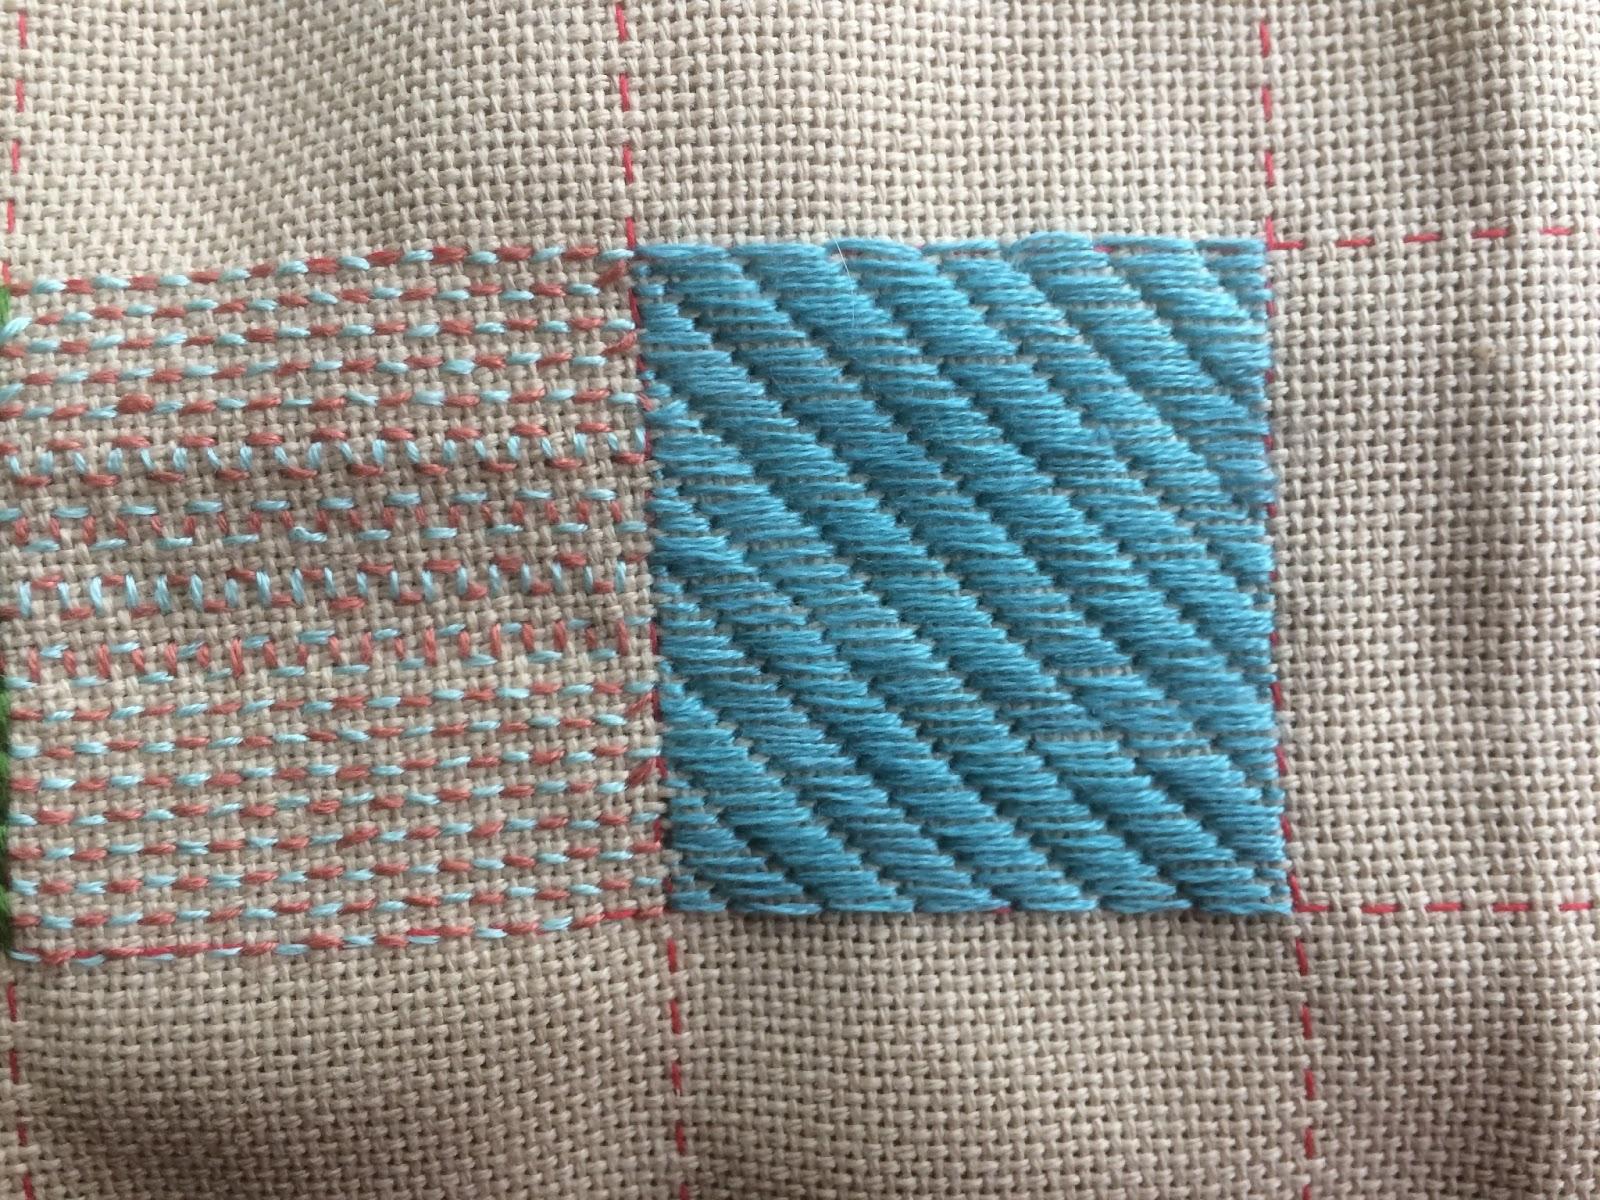 Queenie S Needlework Friday Homework For Lesson 34